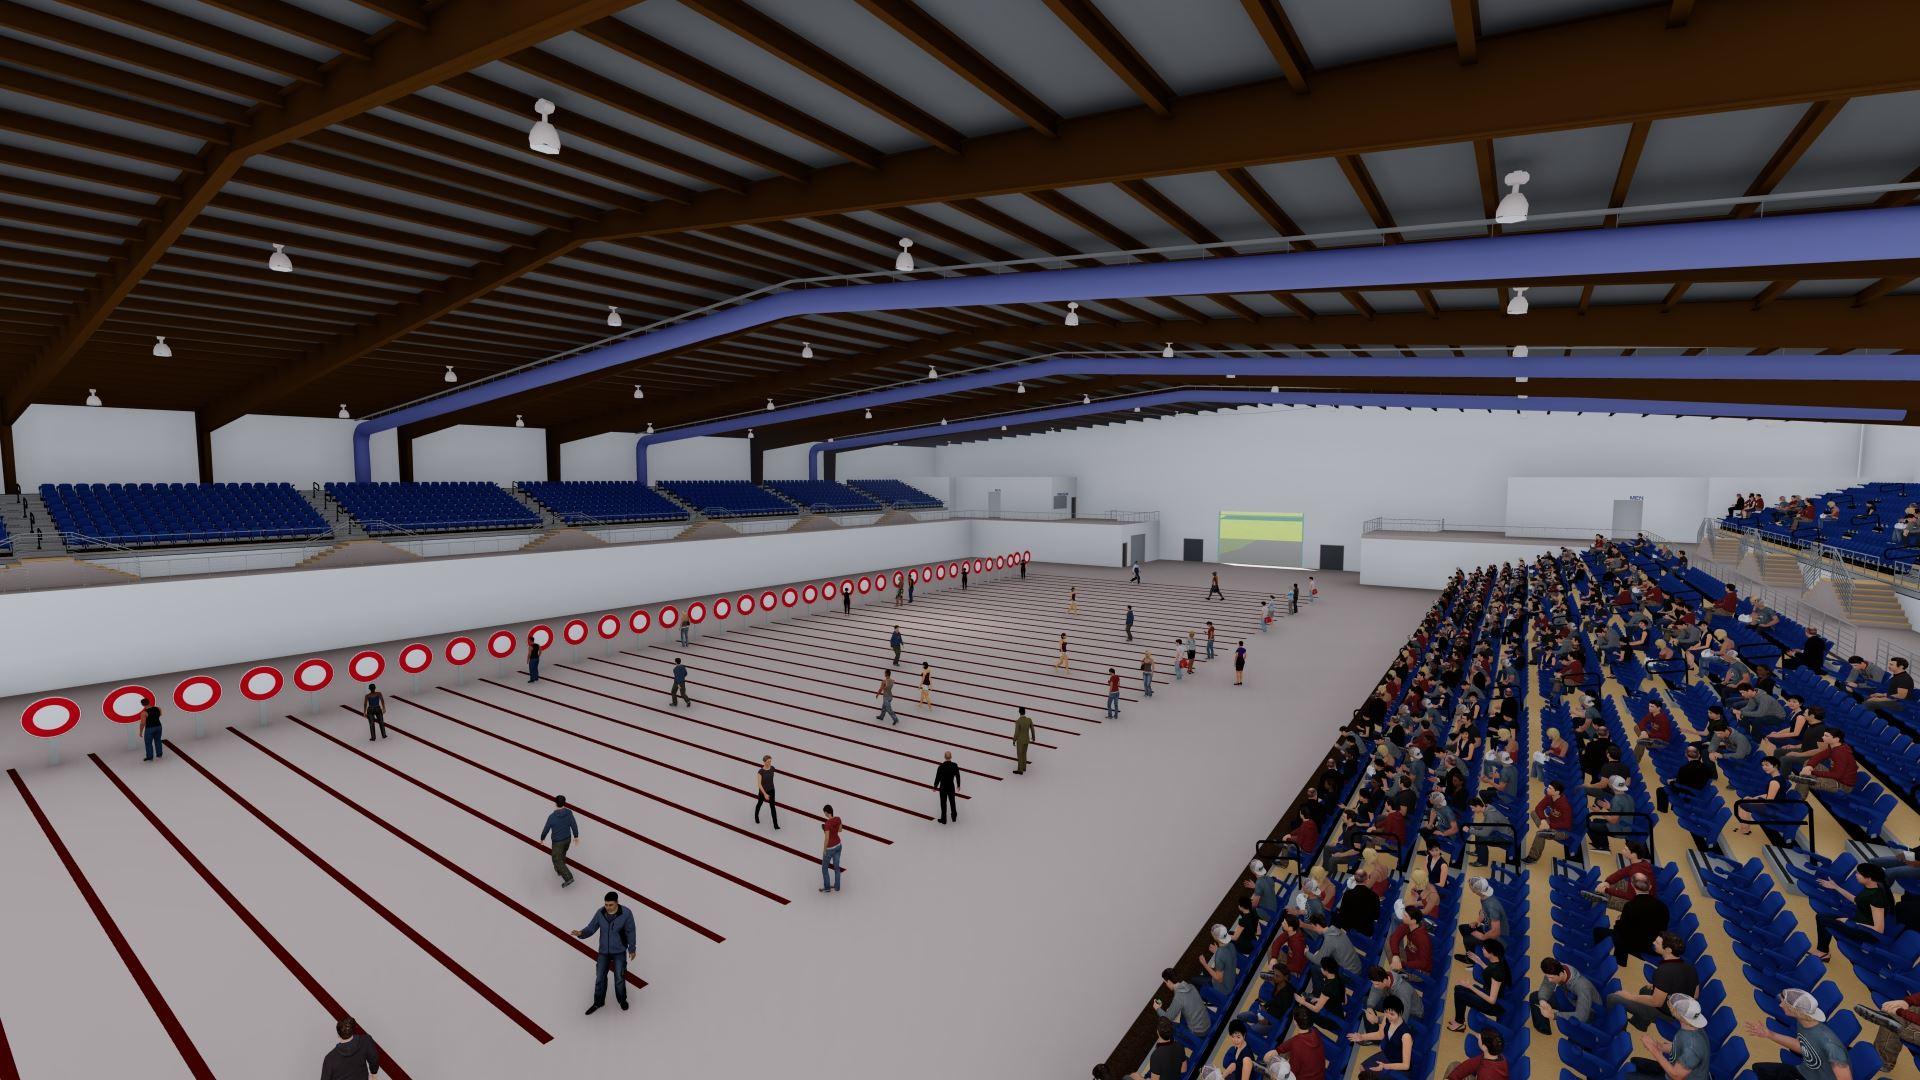 New arena archery tournament rendition